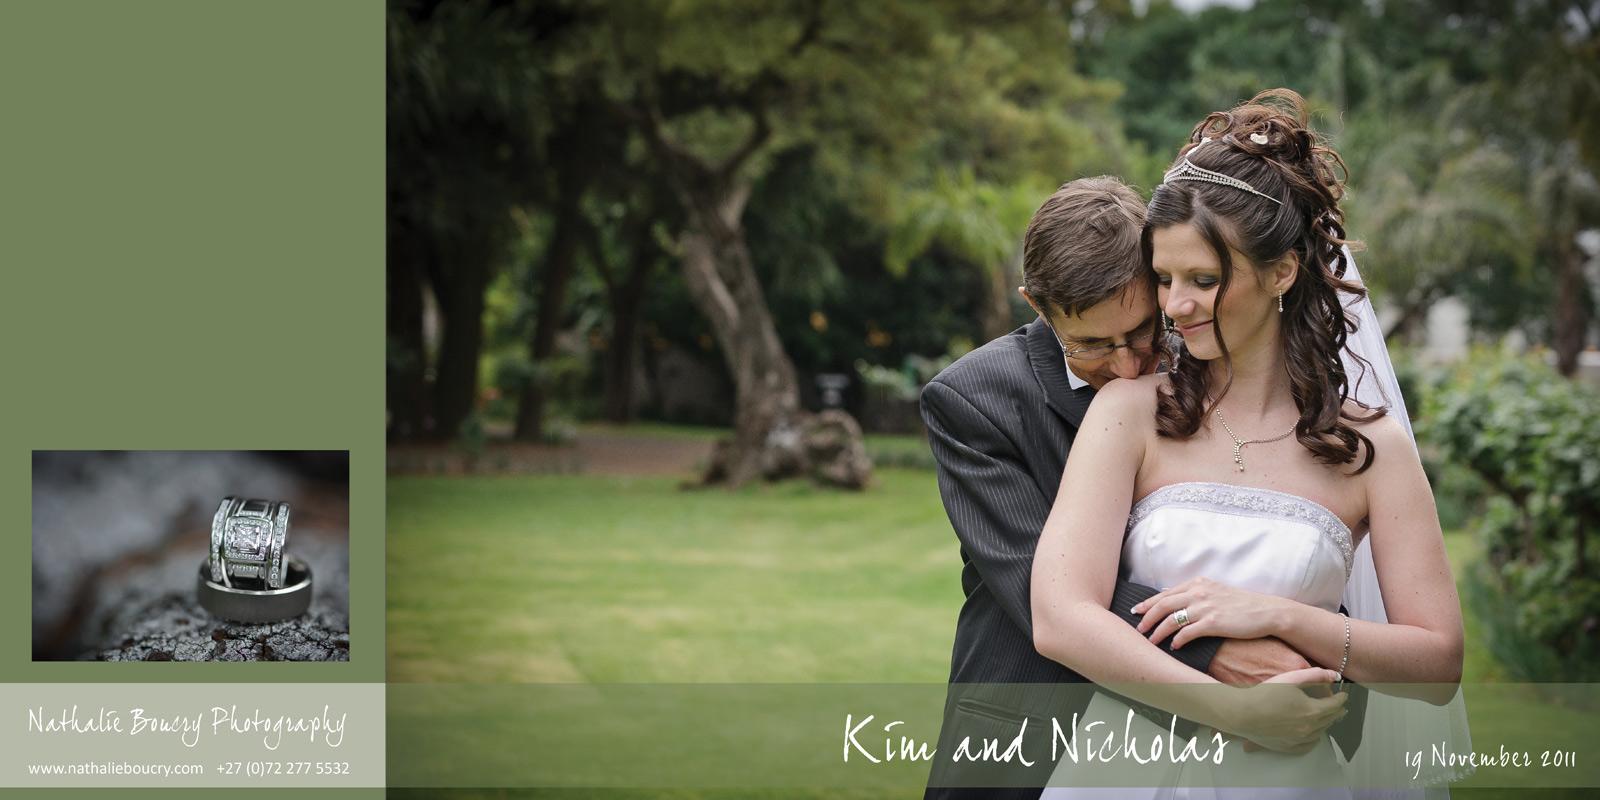 Nathalie Boucry Photography | Kim and Nicholas Wedding Album